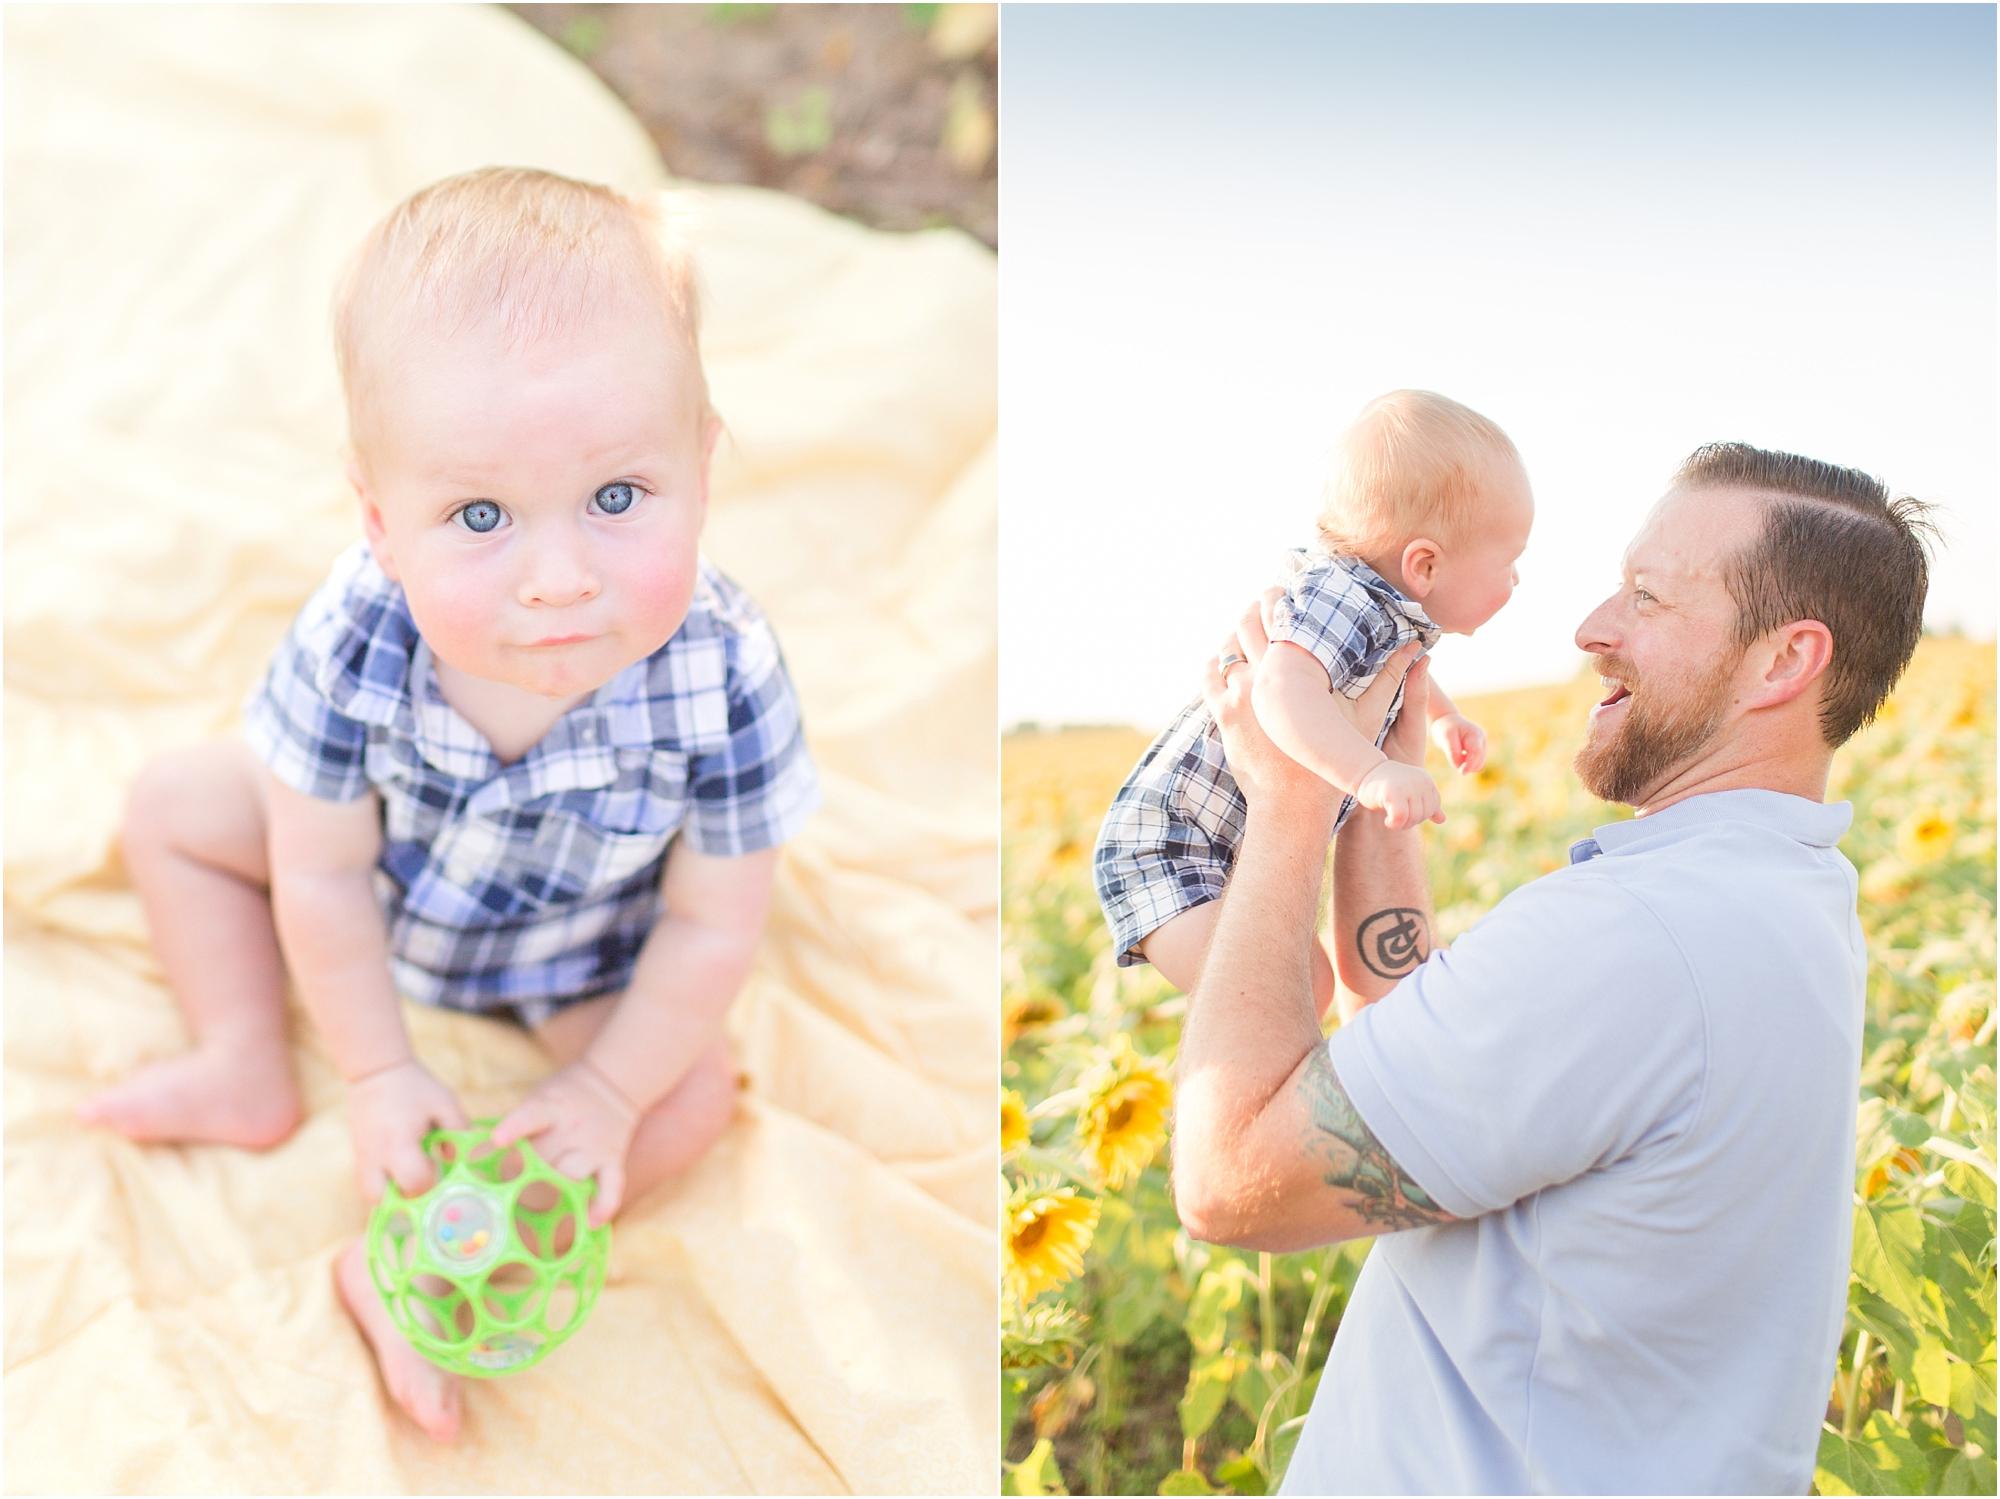 Andrews Family 2016-152_anna grace photography baltimore maryland maternity family photographer sunflower field photo.jpg